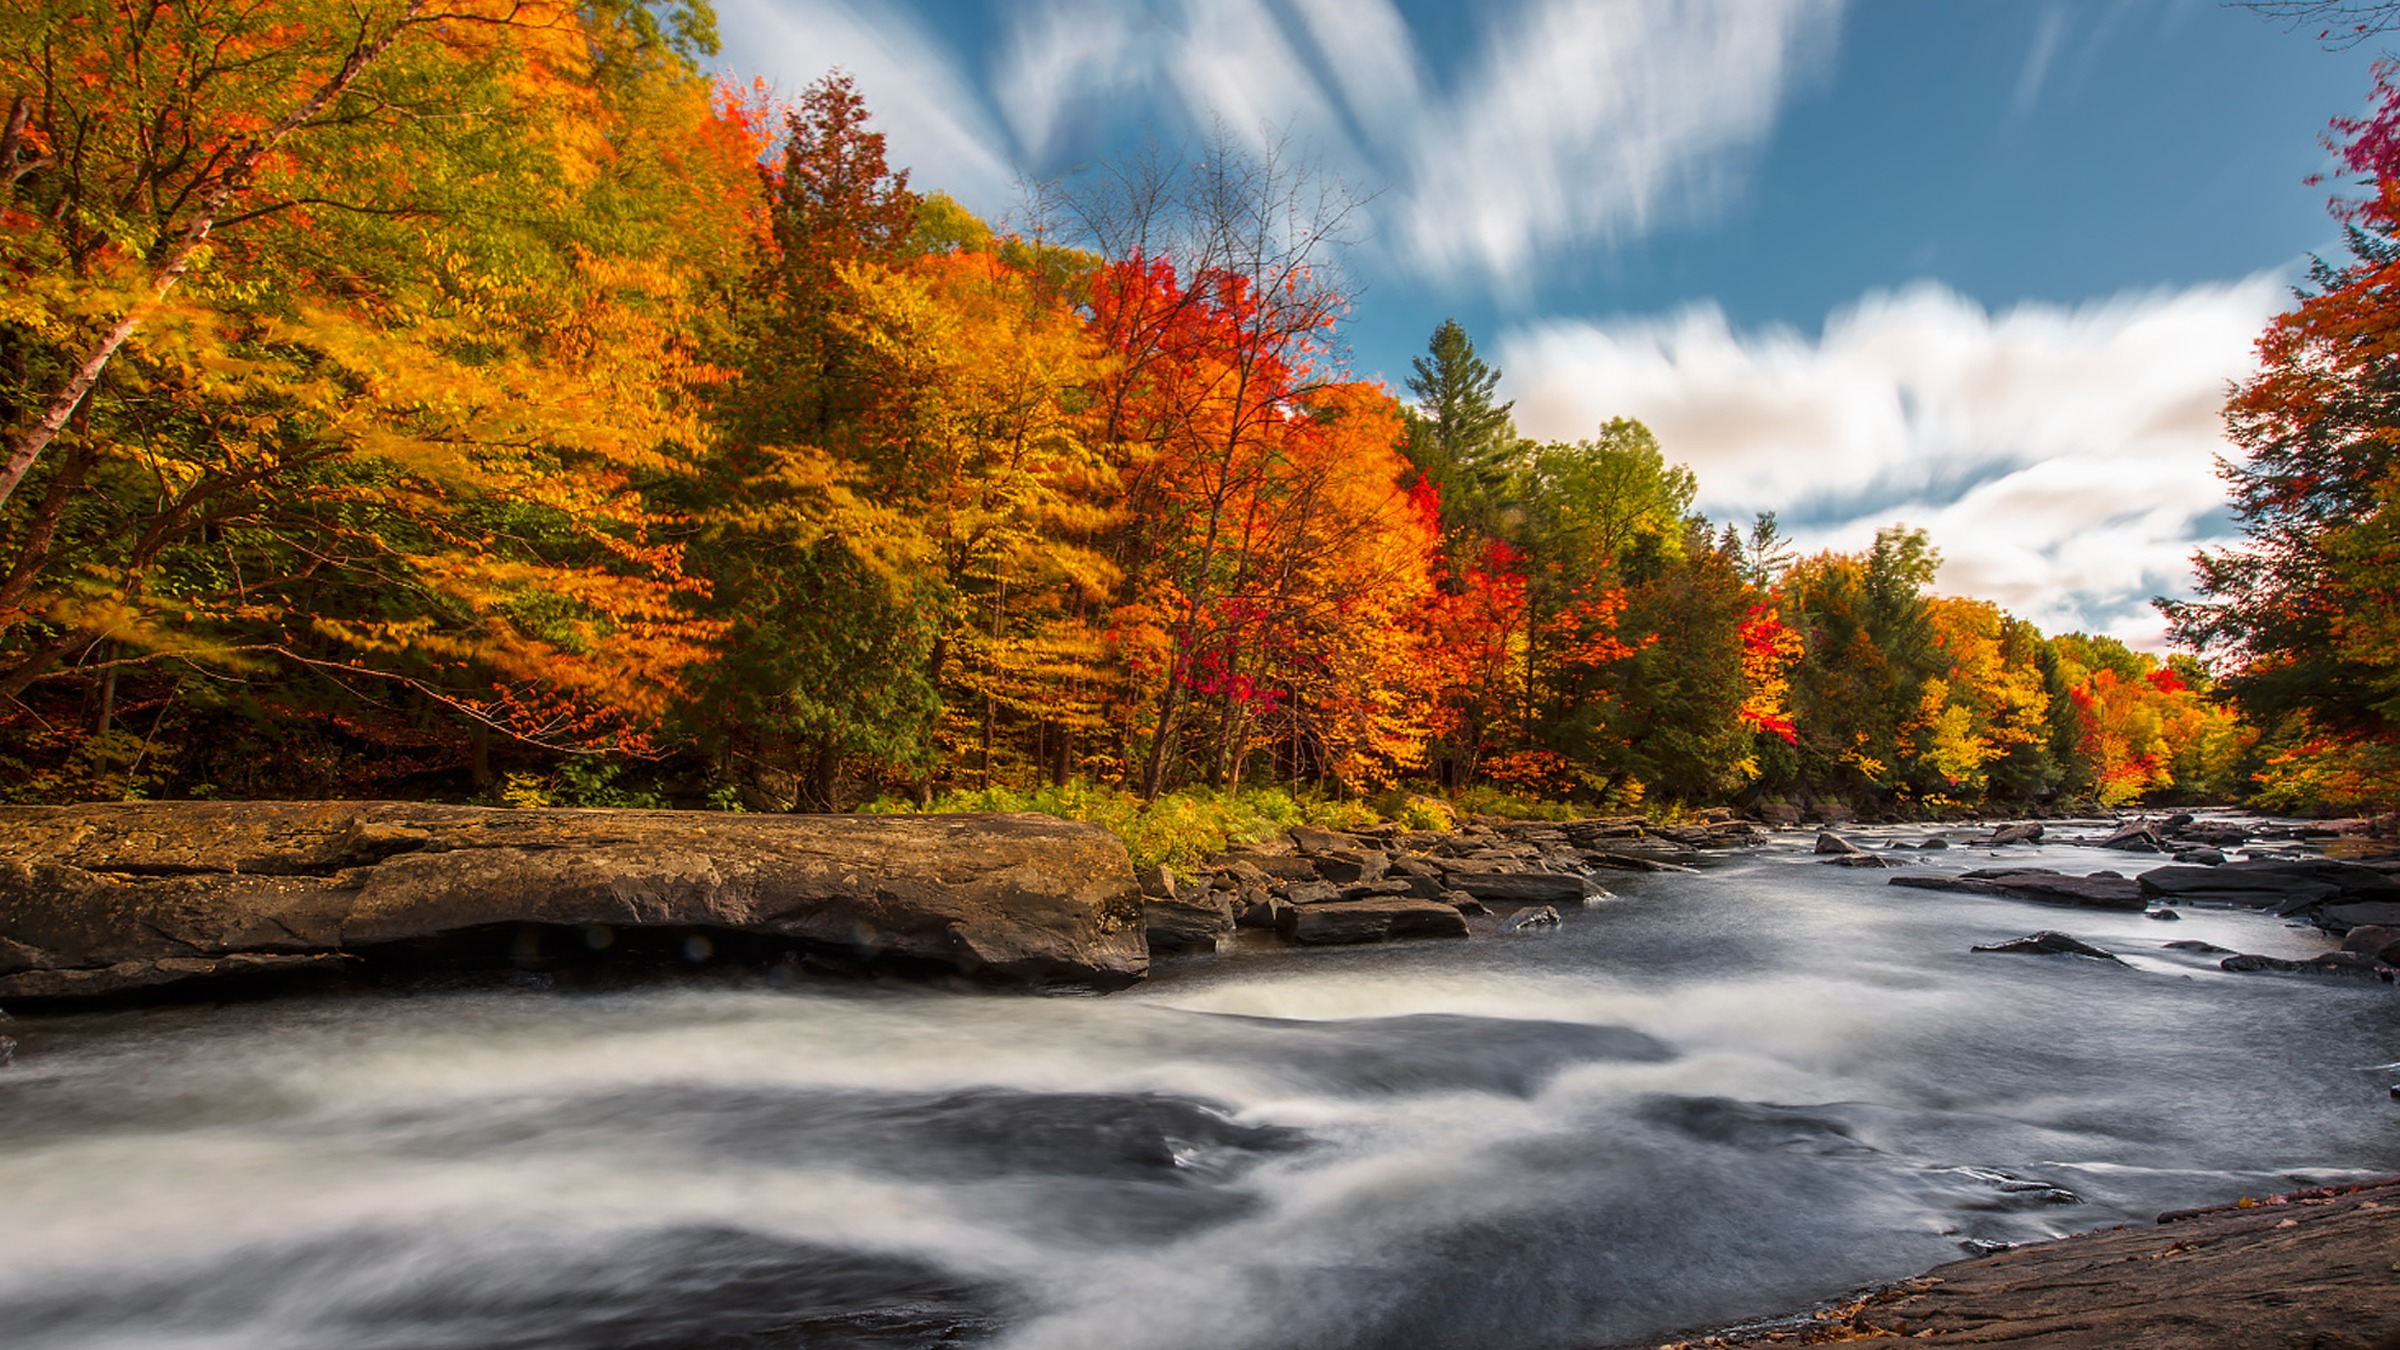 Beautiful Niagara Falls Wallpaper Top 10 Reasons To Visit Muskoka In Autumn